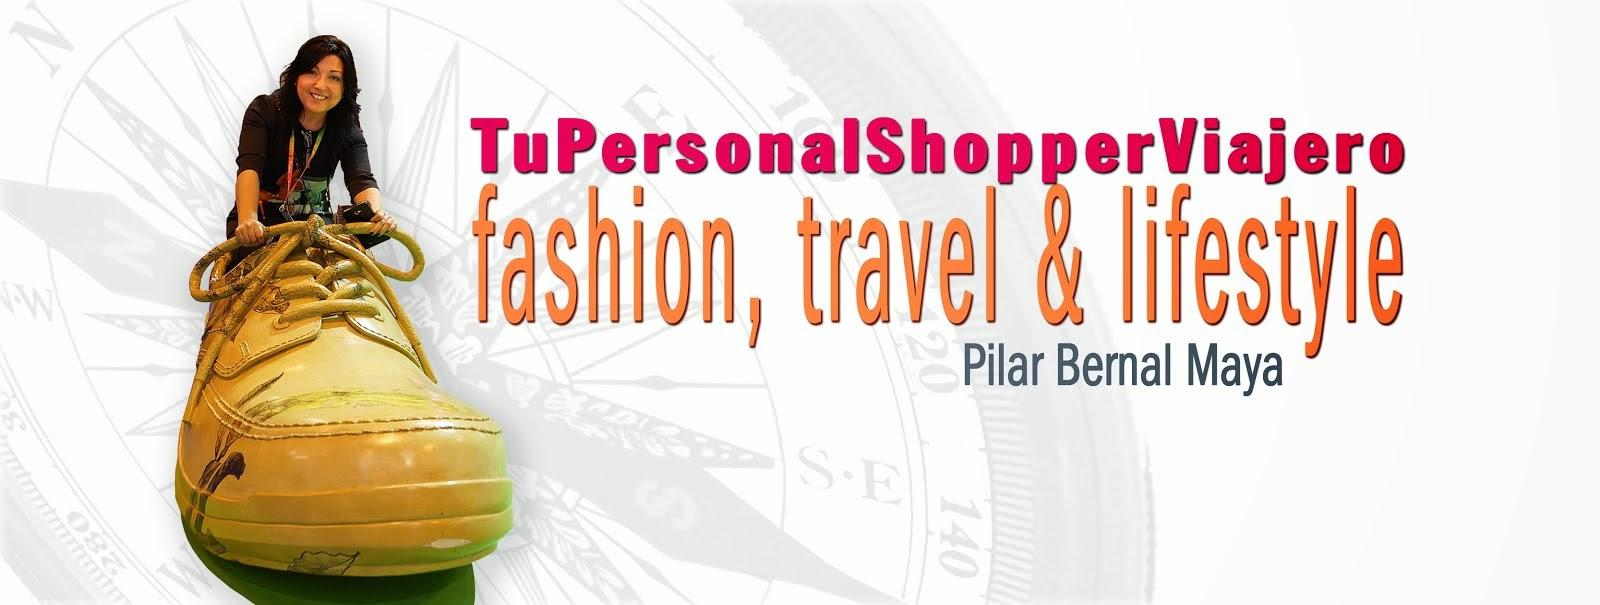 Lifestyle Blog Tupersonalshopperviajero - Moda, Viajes y Belleza